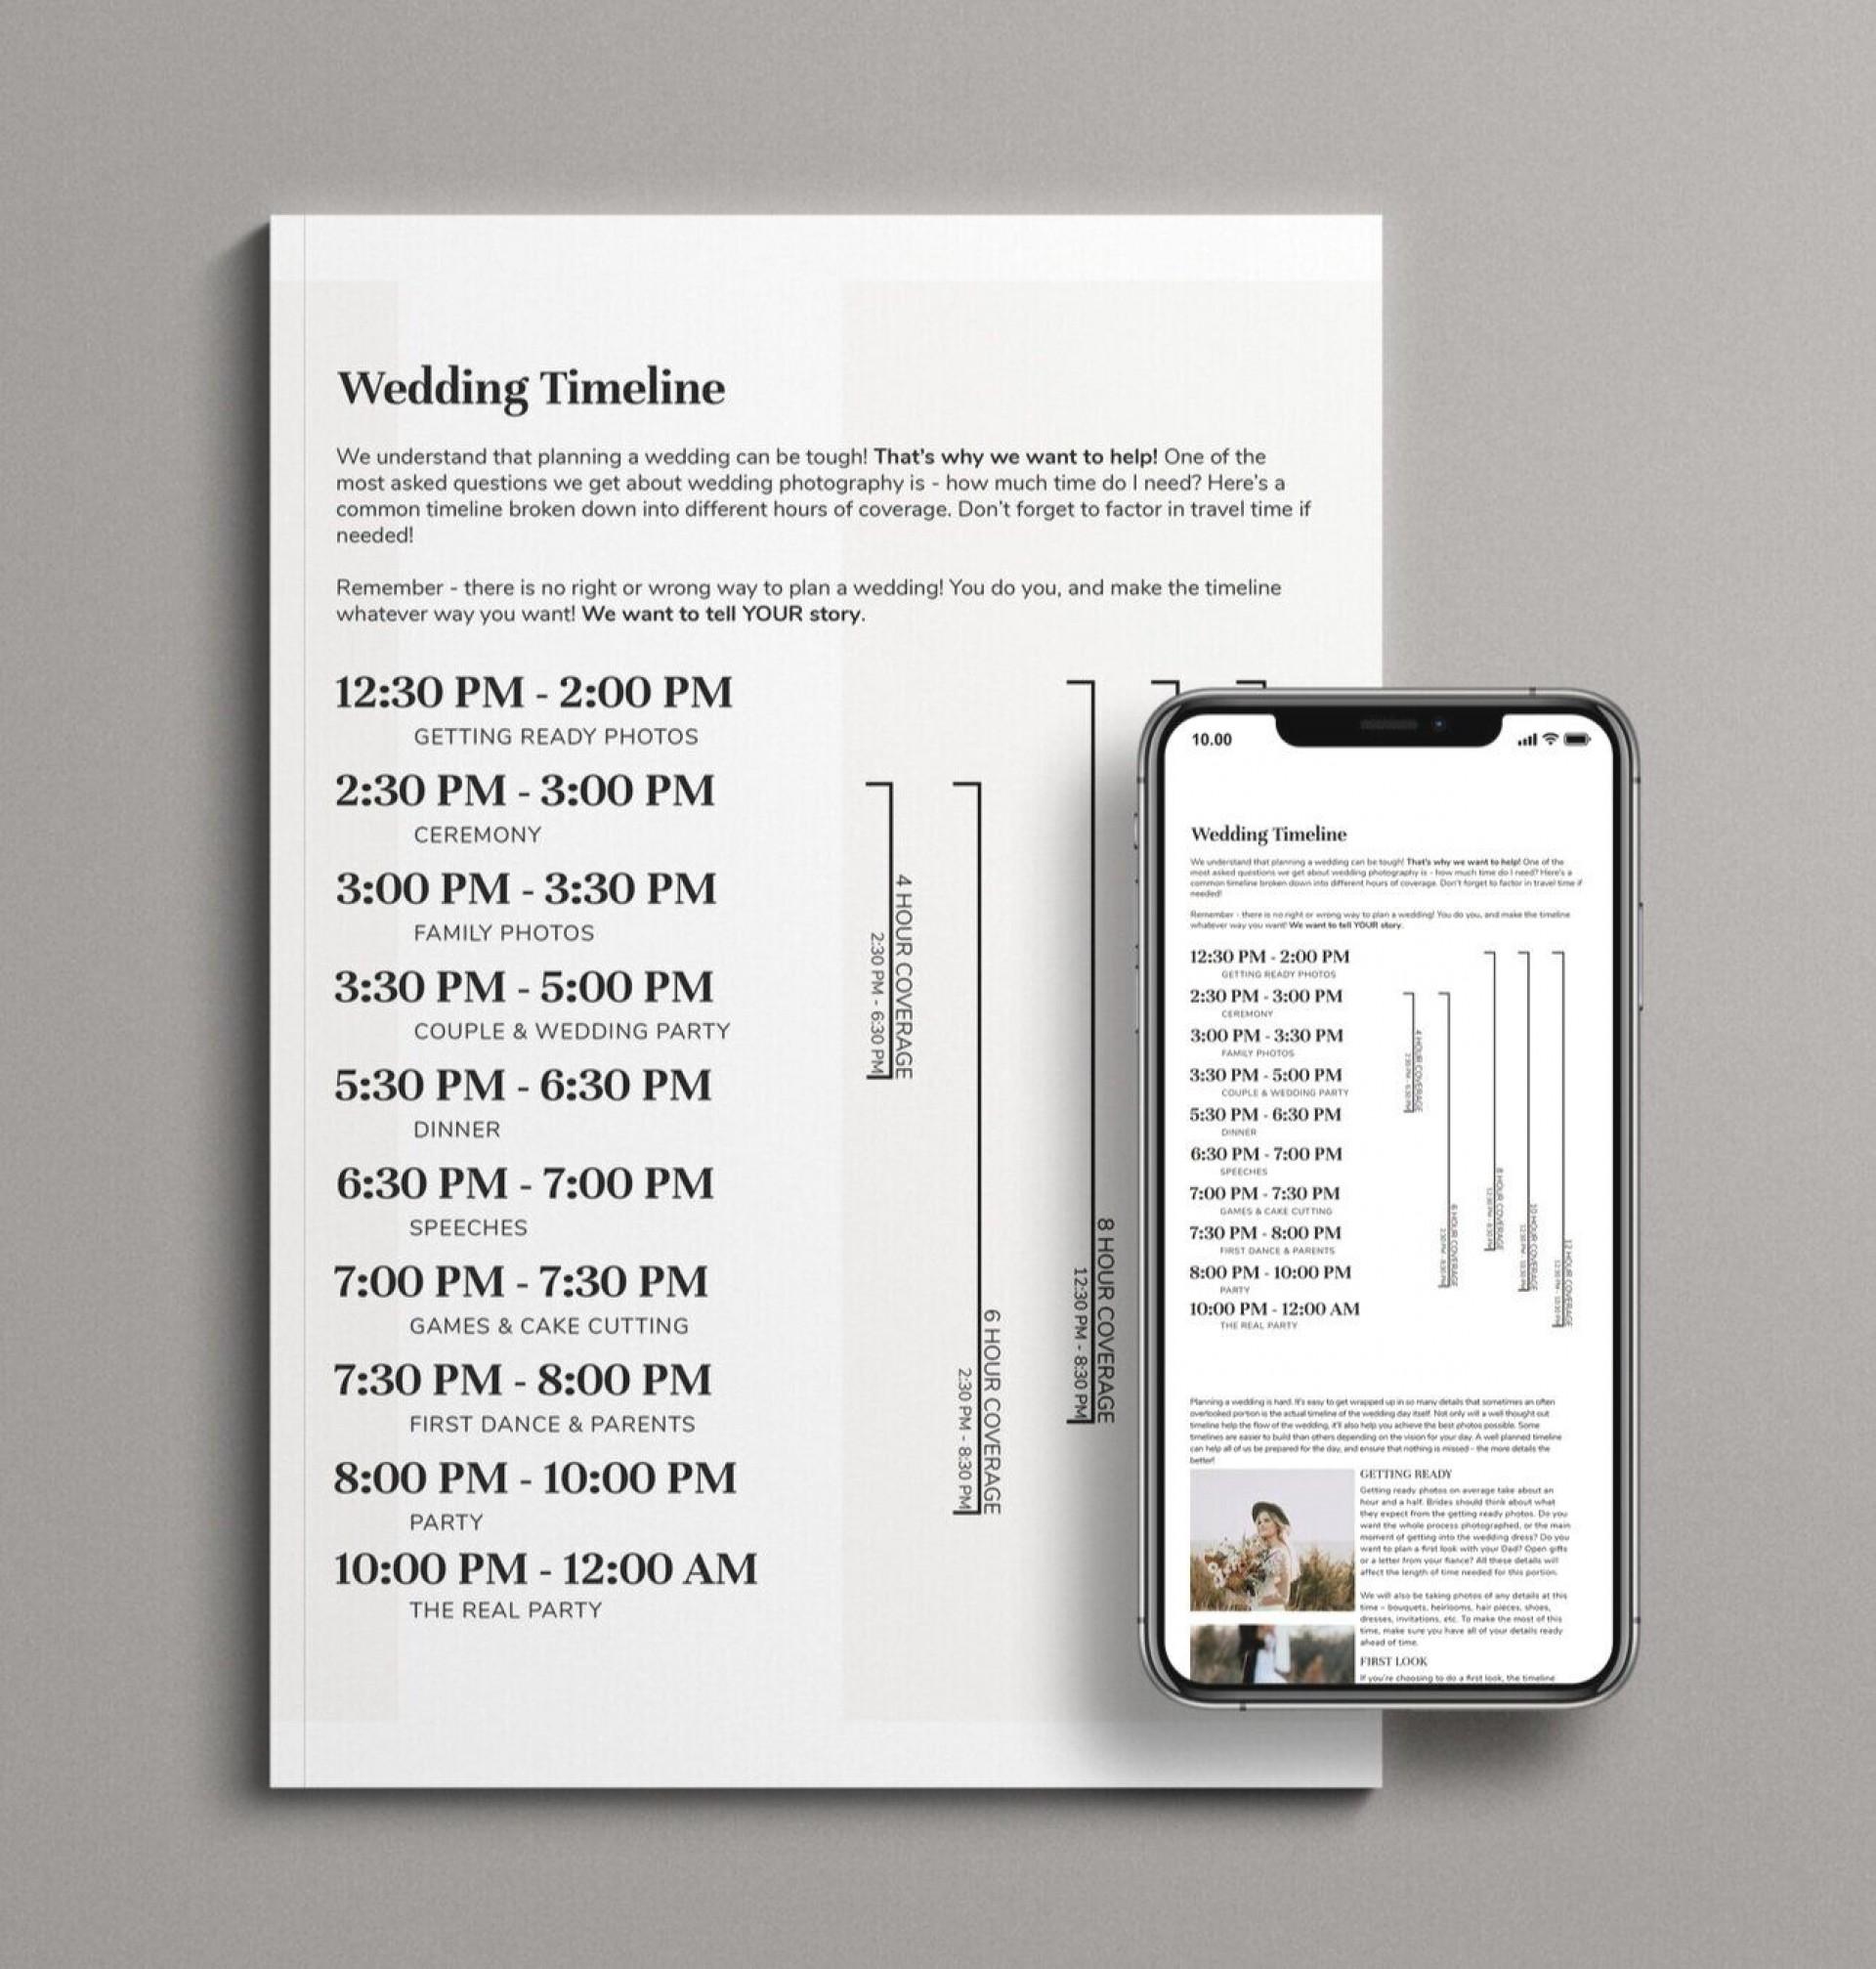 006 Singular Wedding Timeline Template Free Image  Day Excel Program1920